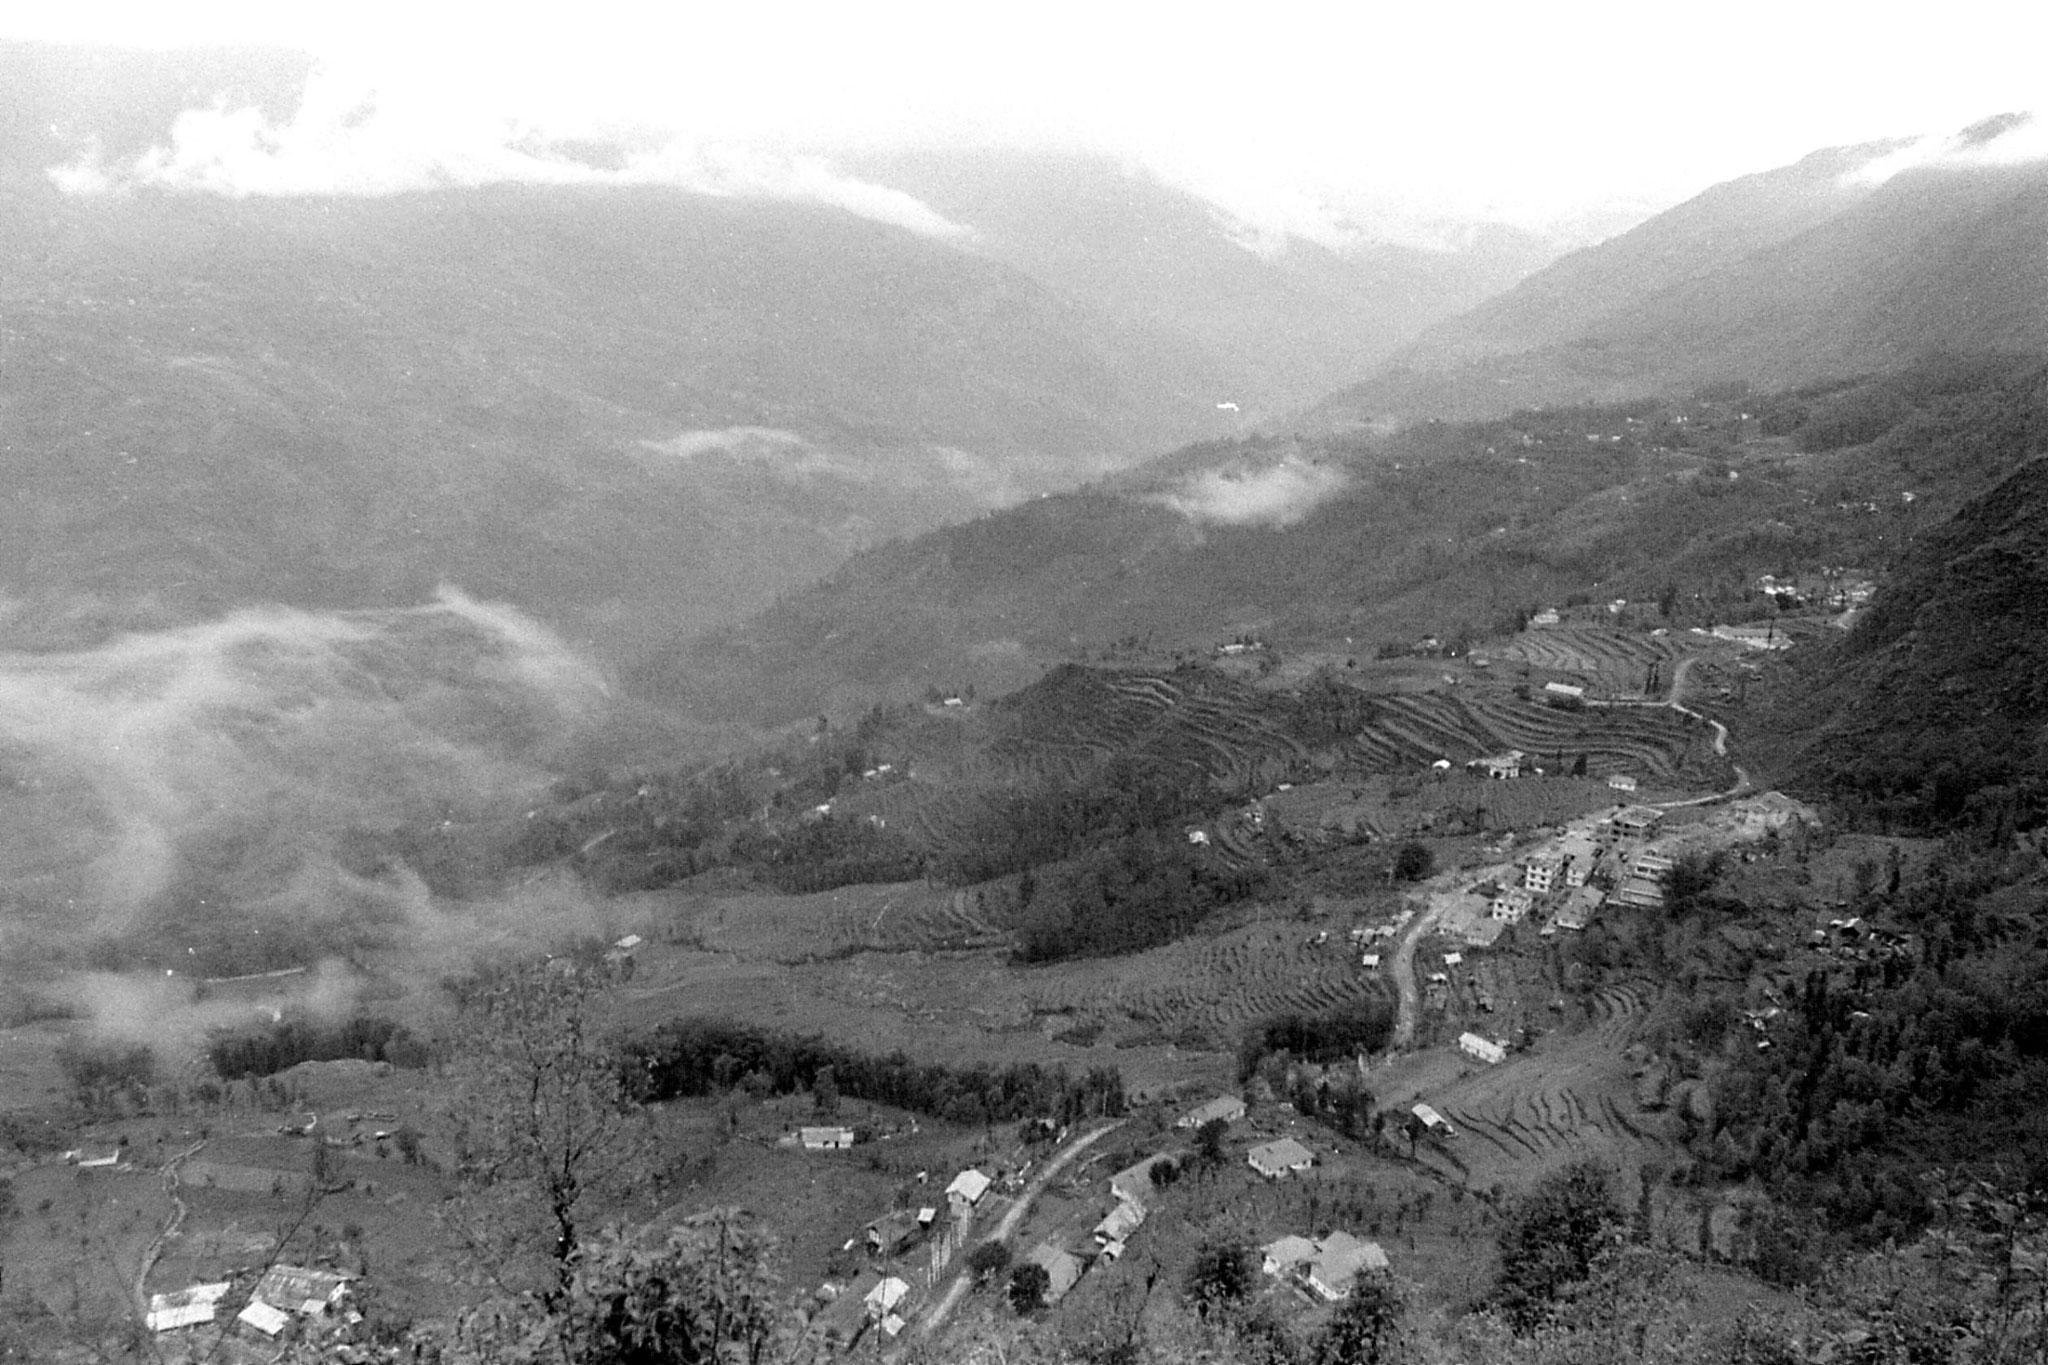 27/4/1990: 30: Pelling Sanga-Choling monastery